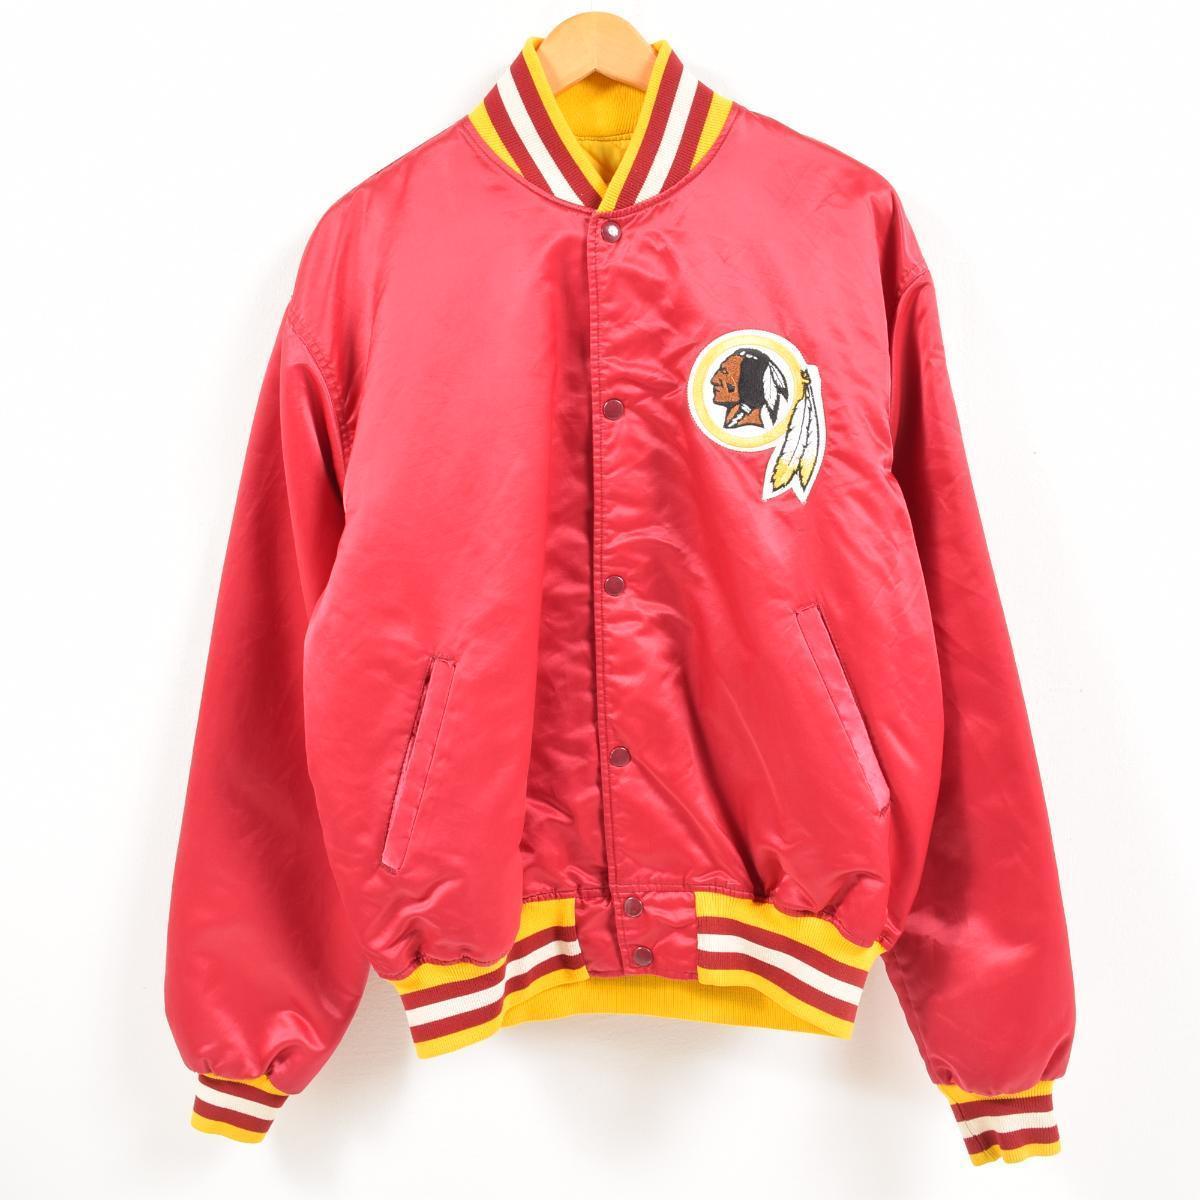 fcd1649e9 Men XL  waw7171 in the 90s made in starter Starter NFL WASHINGTON REDSKINS  Washington Redskins nylon award jacket Award jacket USA